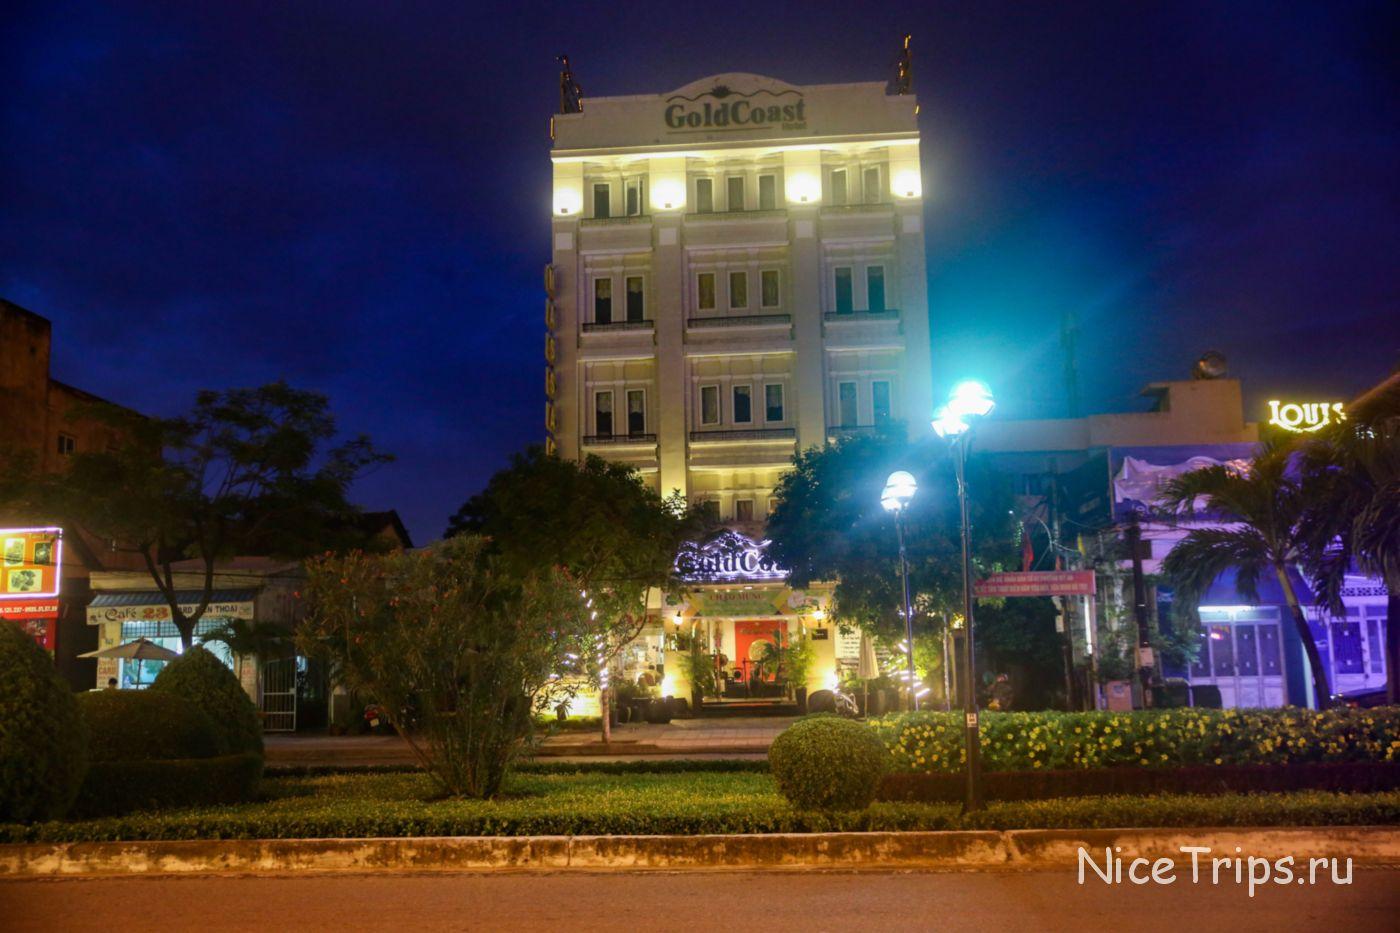 Gold Coast Da Nang